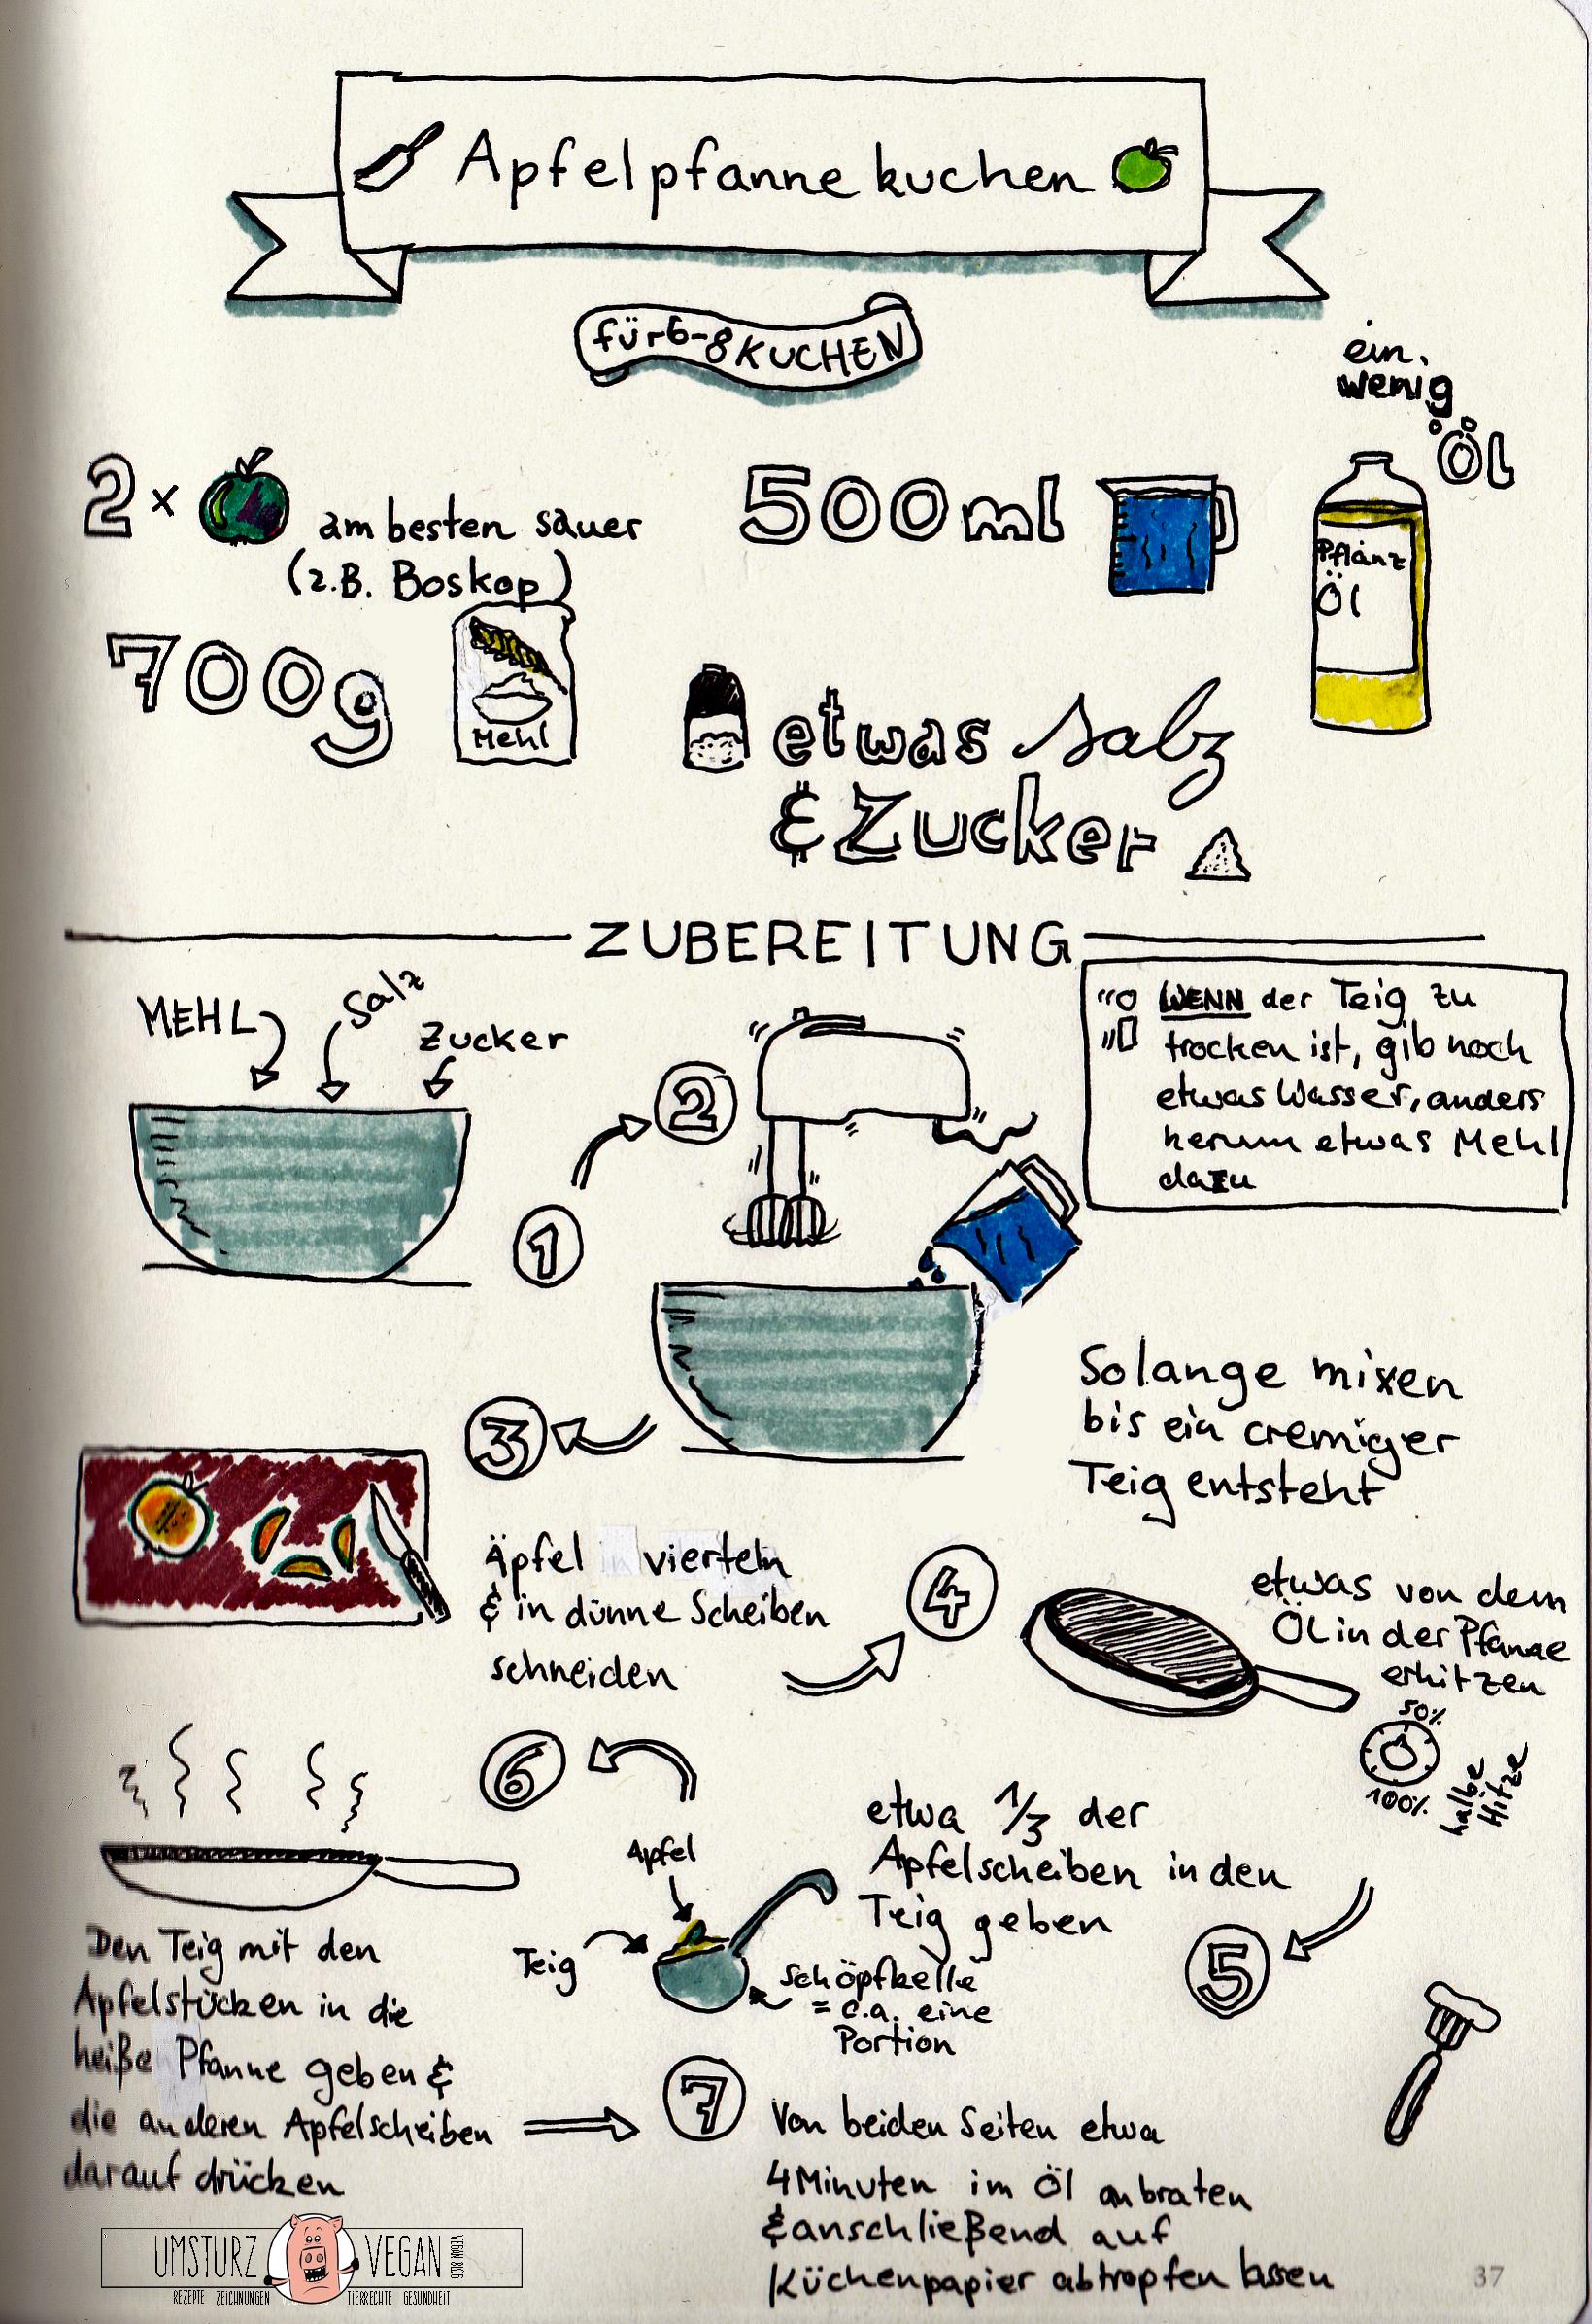 Http Umsturzvegan De Wp Content Uploads 2014 08 Sketchrezept Apfelpfannekuche Kochbuch Selbst Gestalten Sketchnotes Rezepte Kochbuch Selbst Gestalten Vorlage